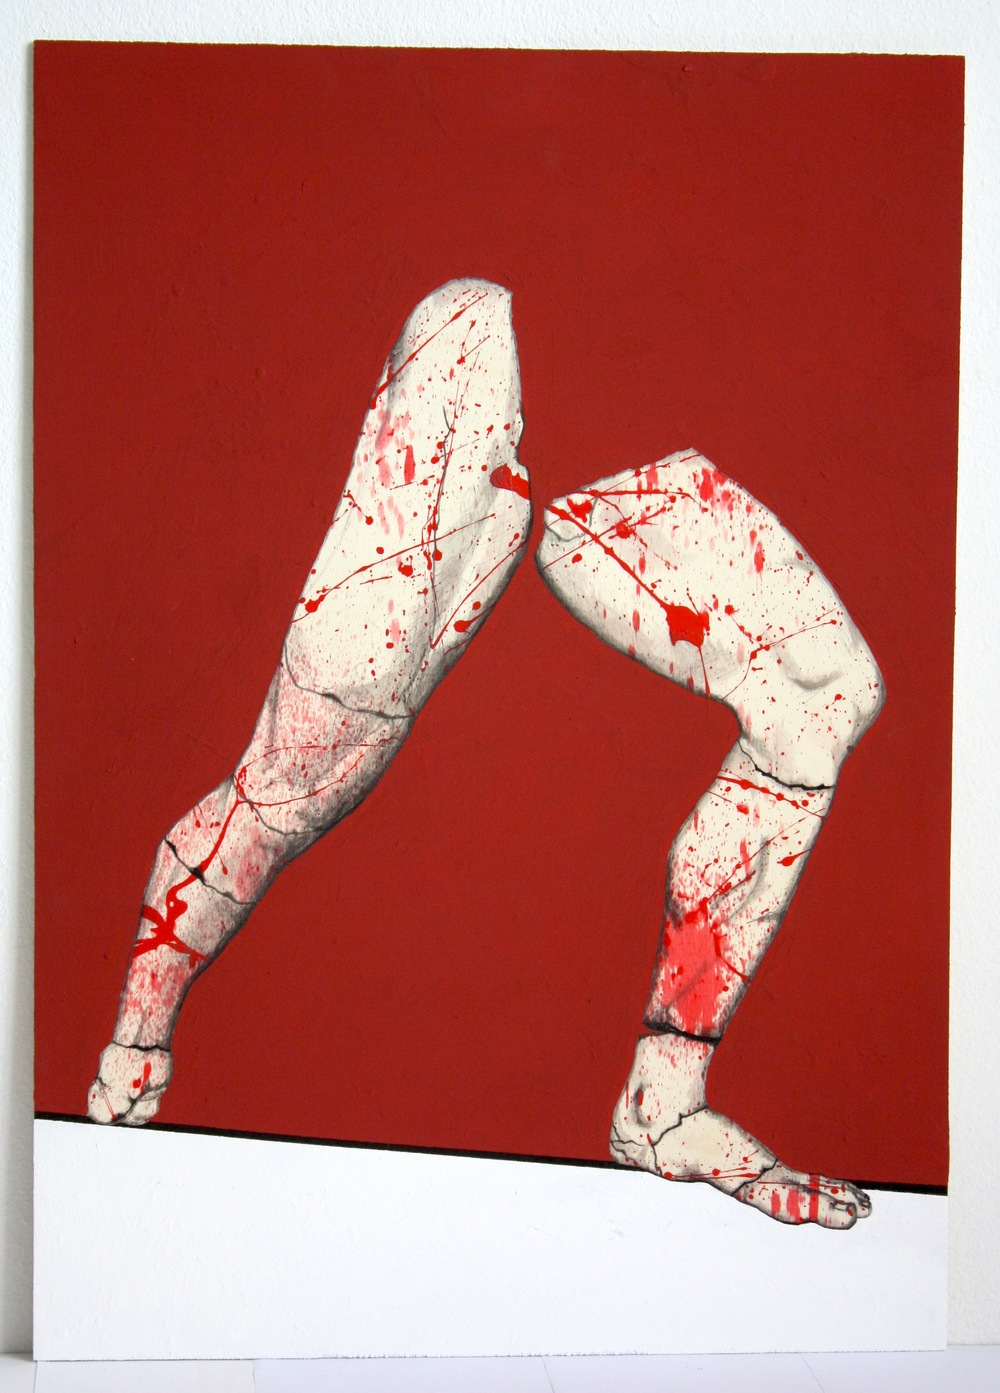 Pollock'd Legs